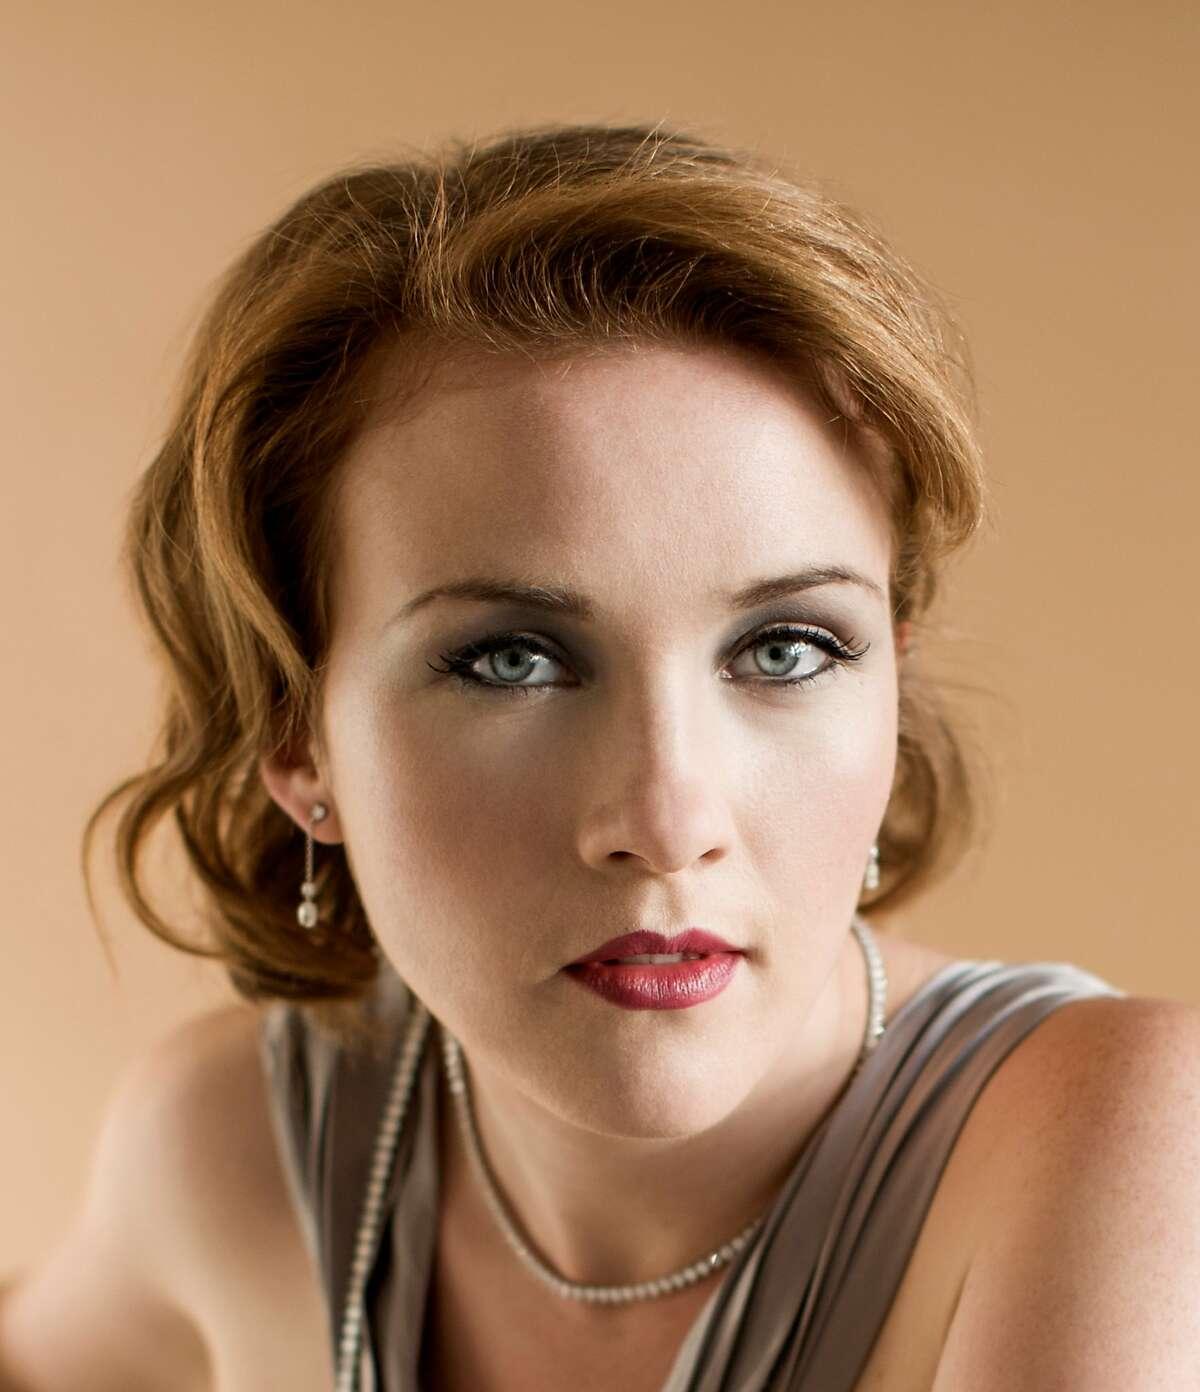 Mezzo-soprano Sasha Cooke performs with the SF Symphony Wednesday-Saturday